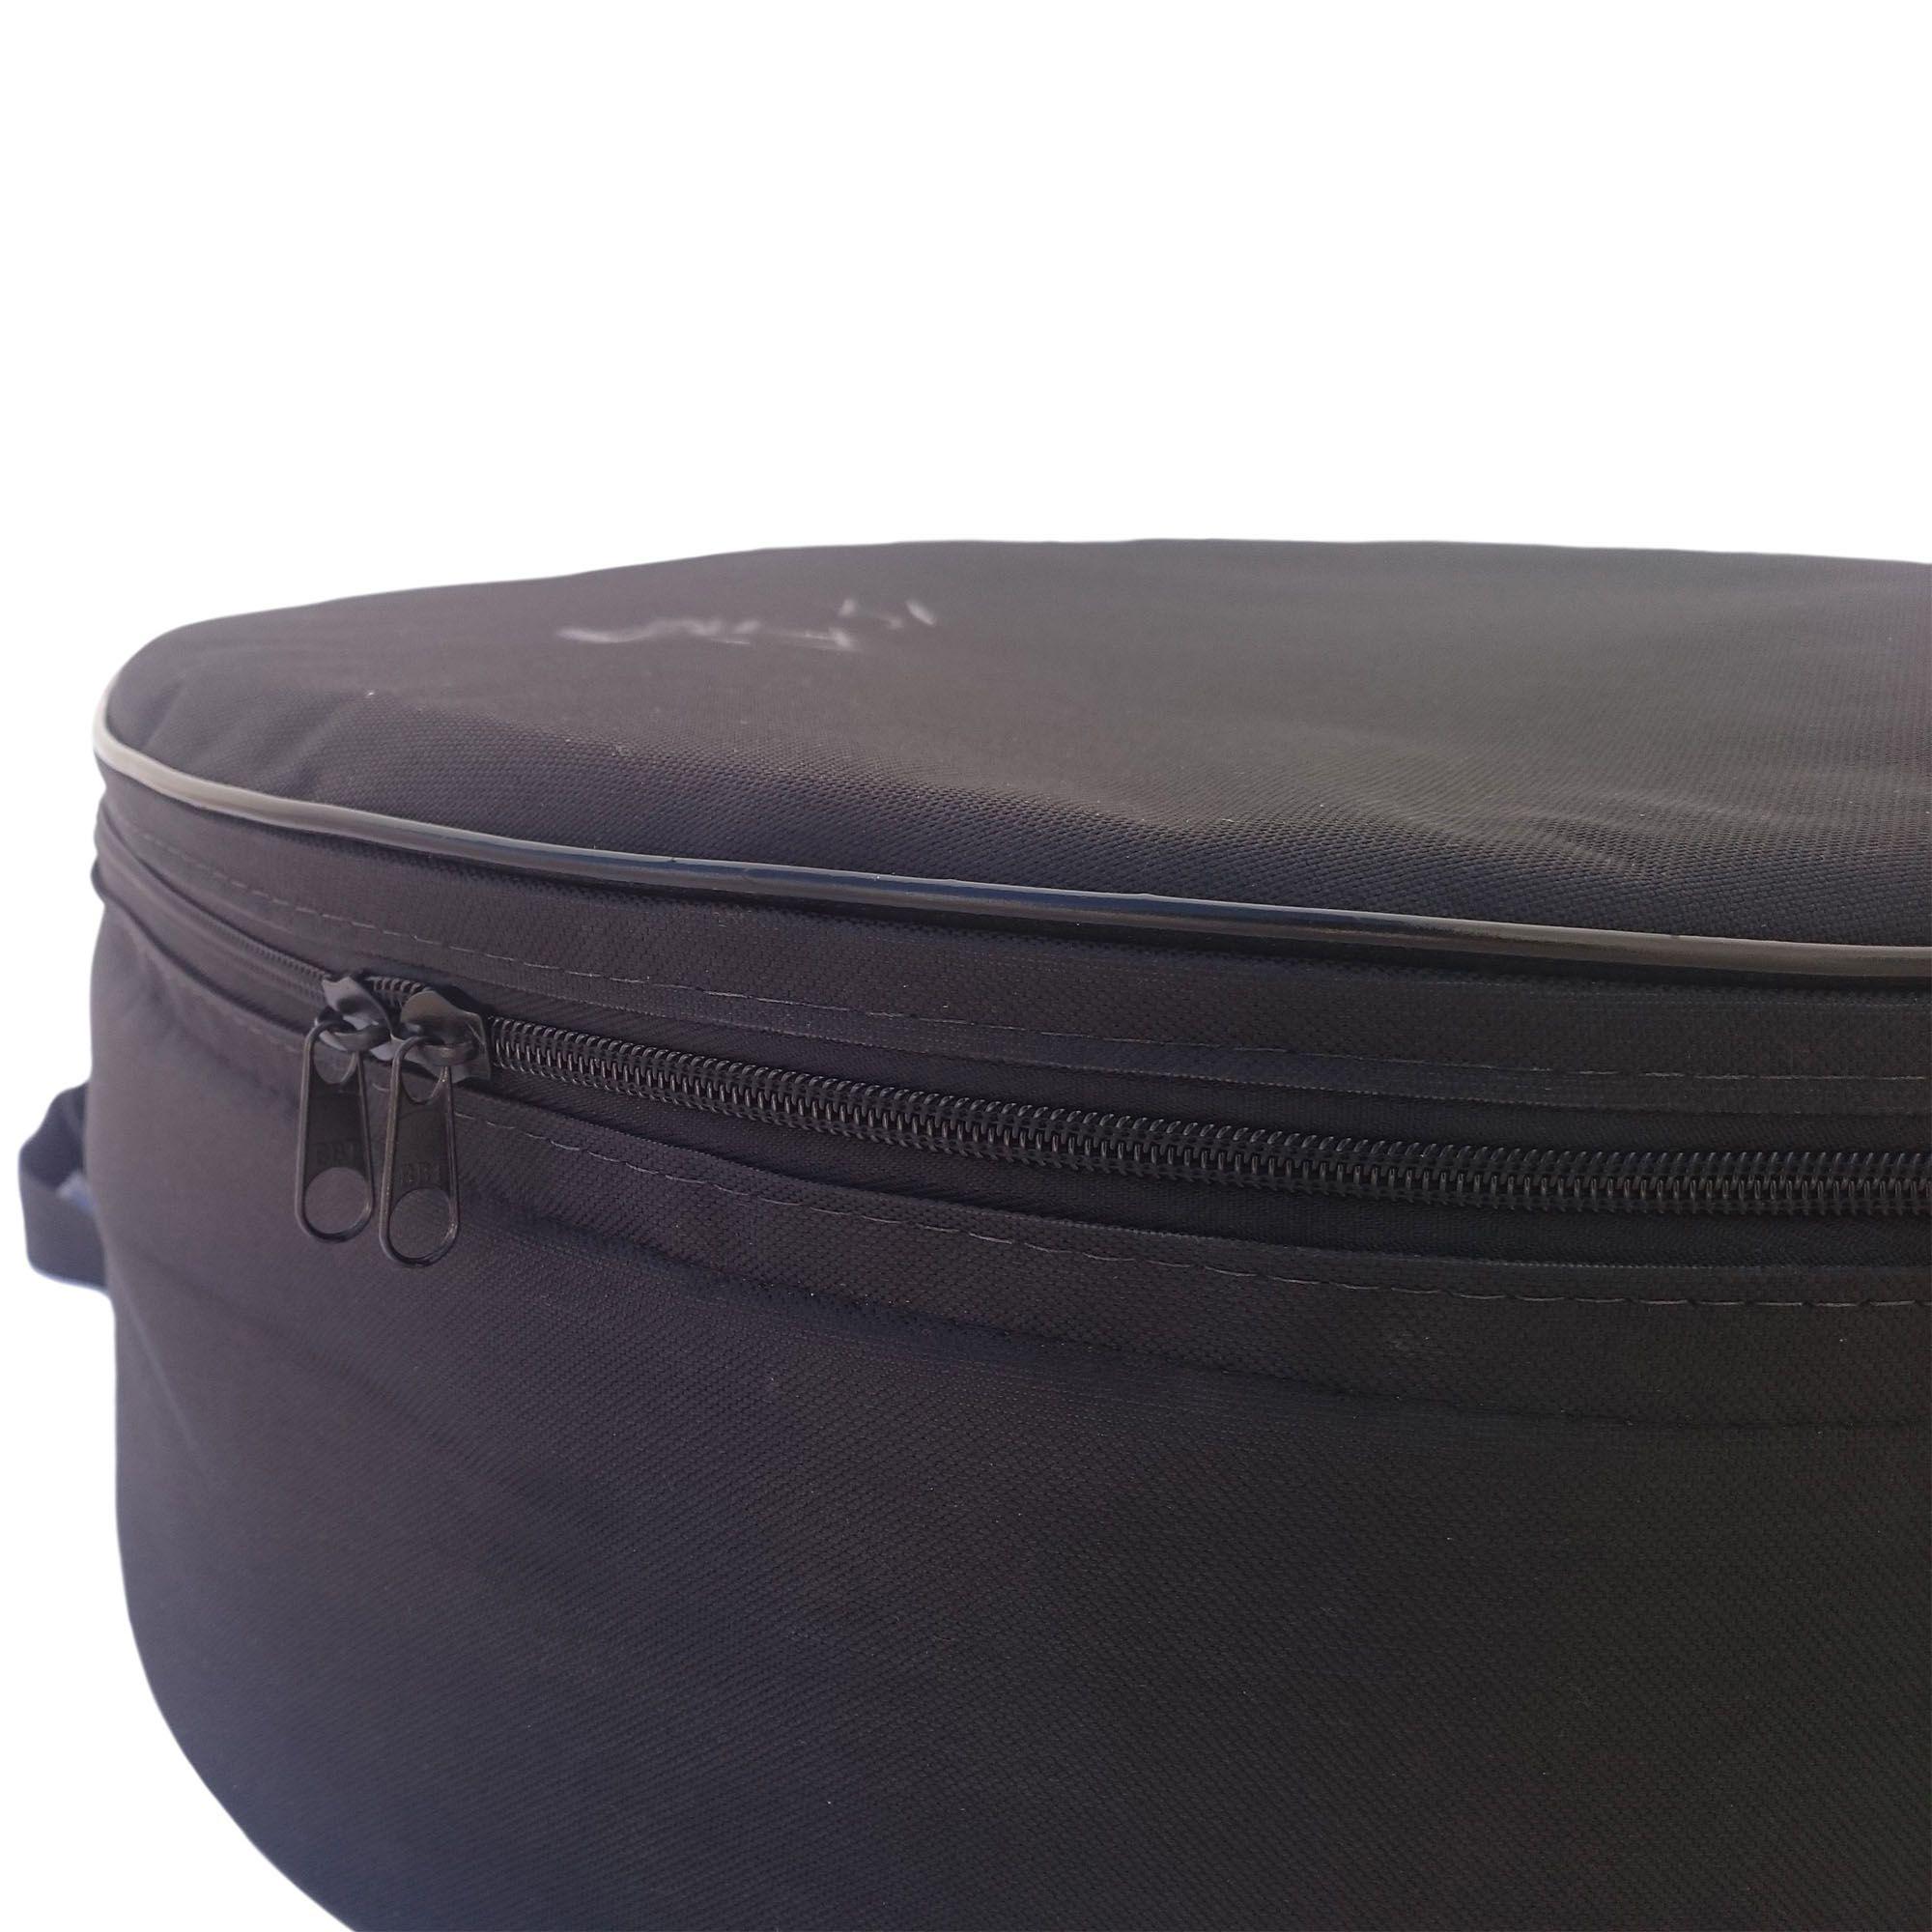 "Capa Bag Extra Luxo para Caixa De Bateria 10"" x 12cm  - ROOSTERMUSIC"